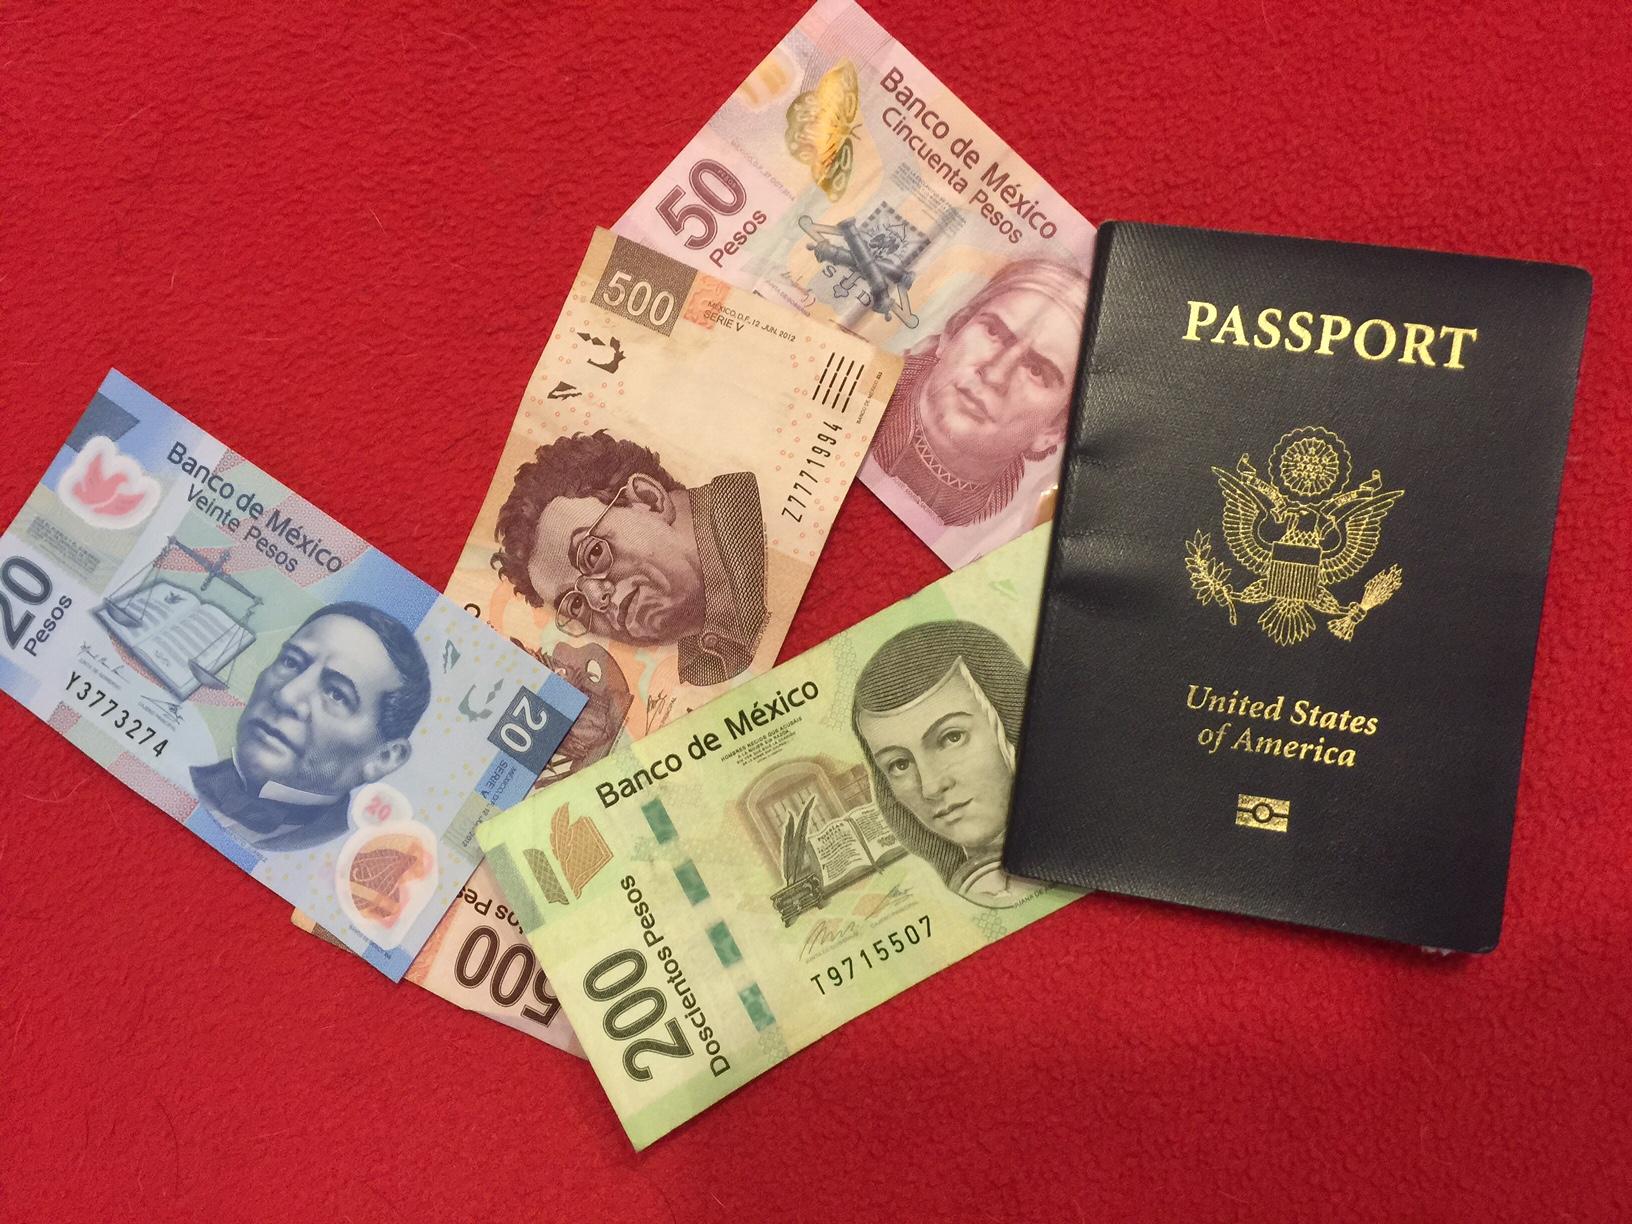 MexicanMoneyUS Passport